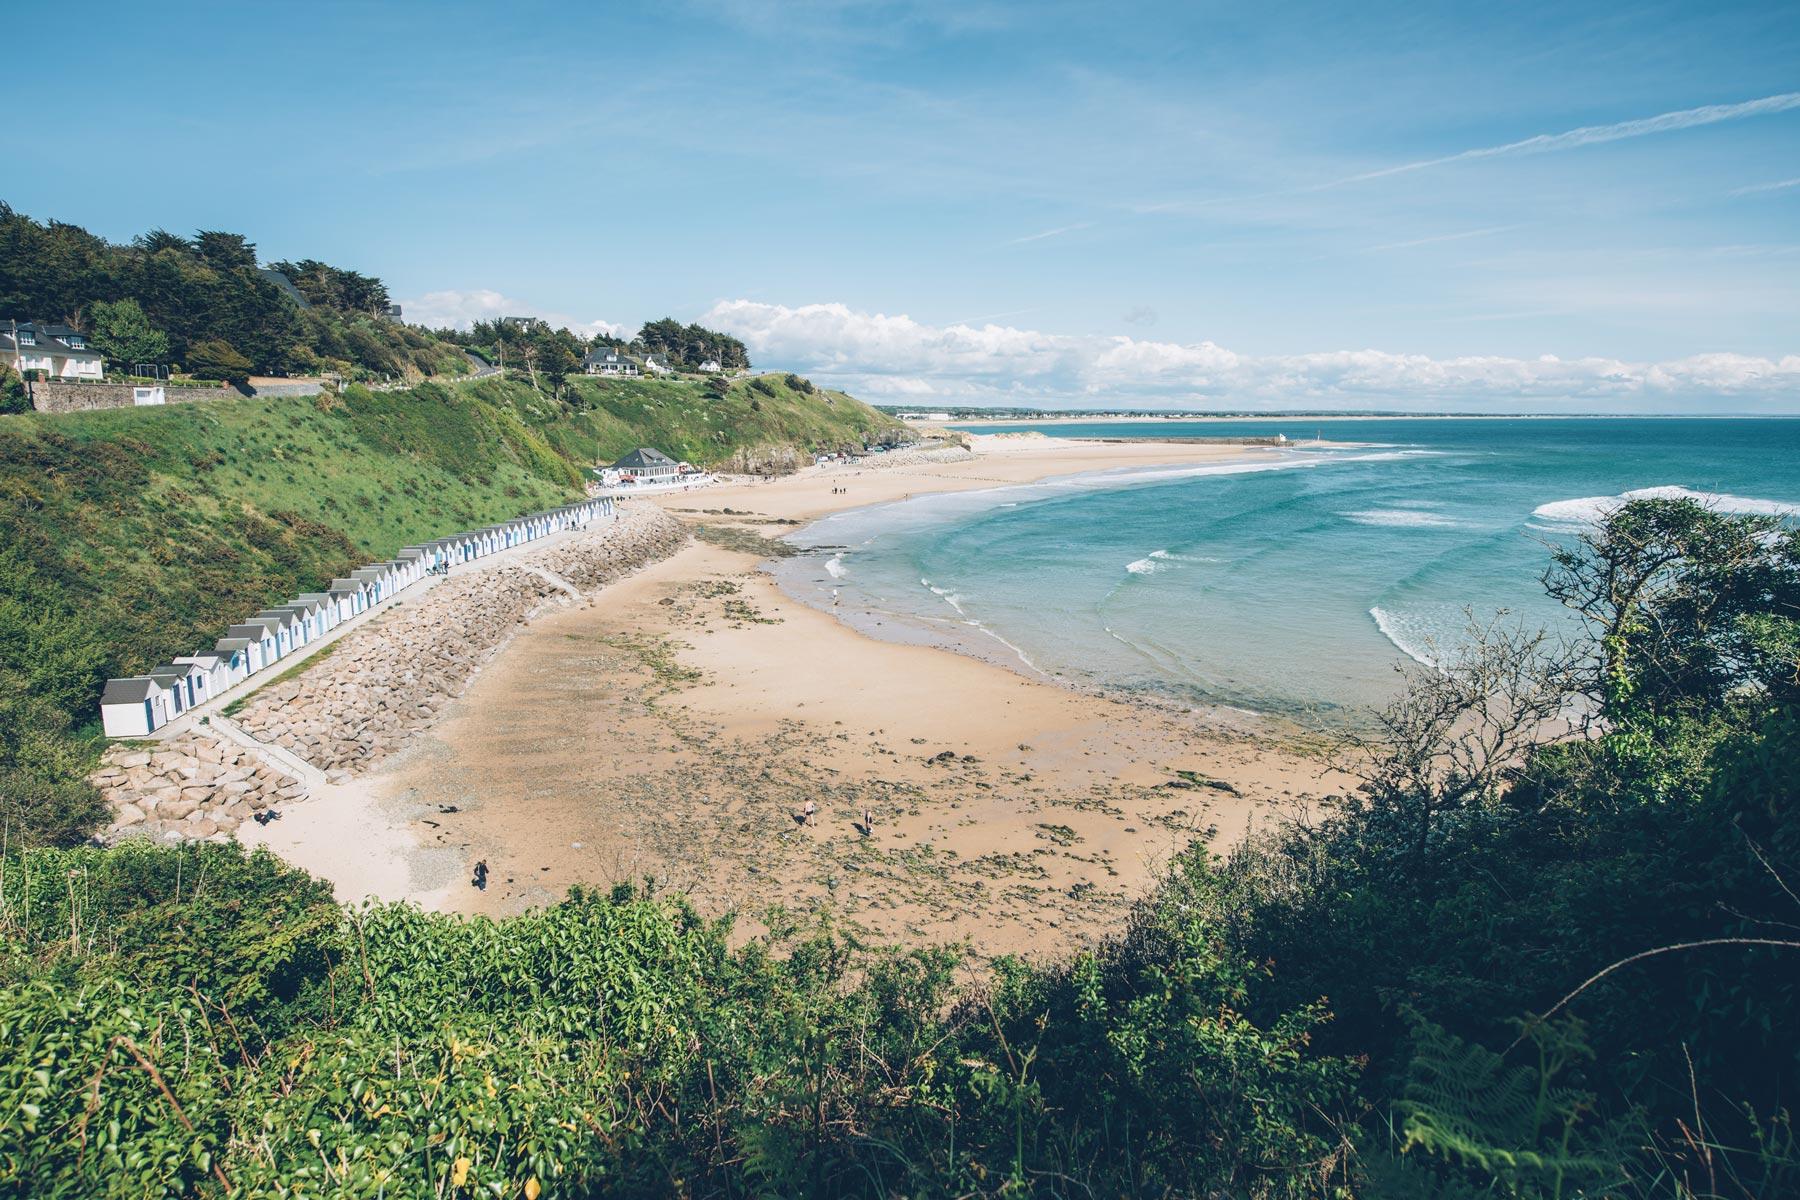 Plage de rêve en Normandie: Carteret